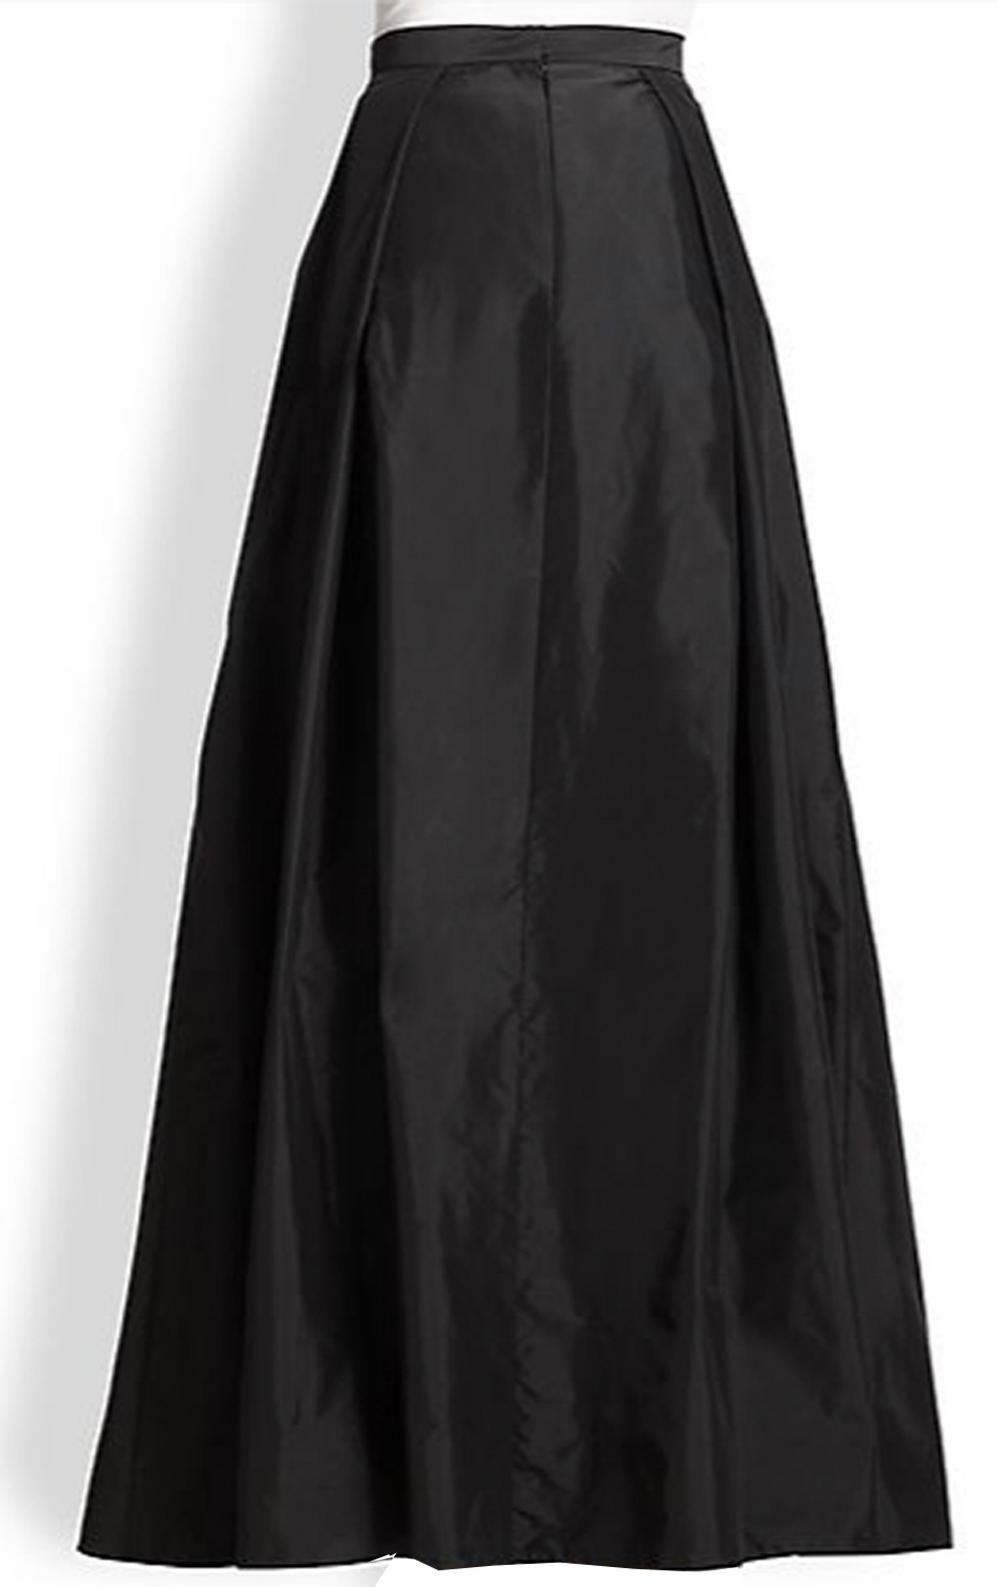 Taffeta Skirts | Dressed Up Girl